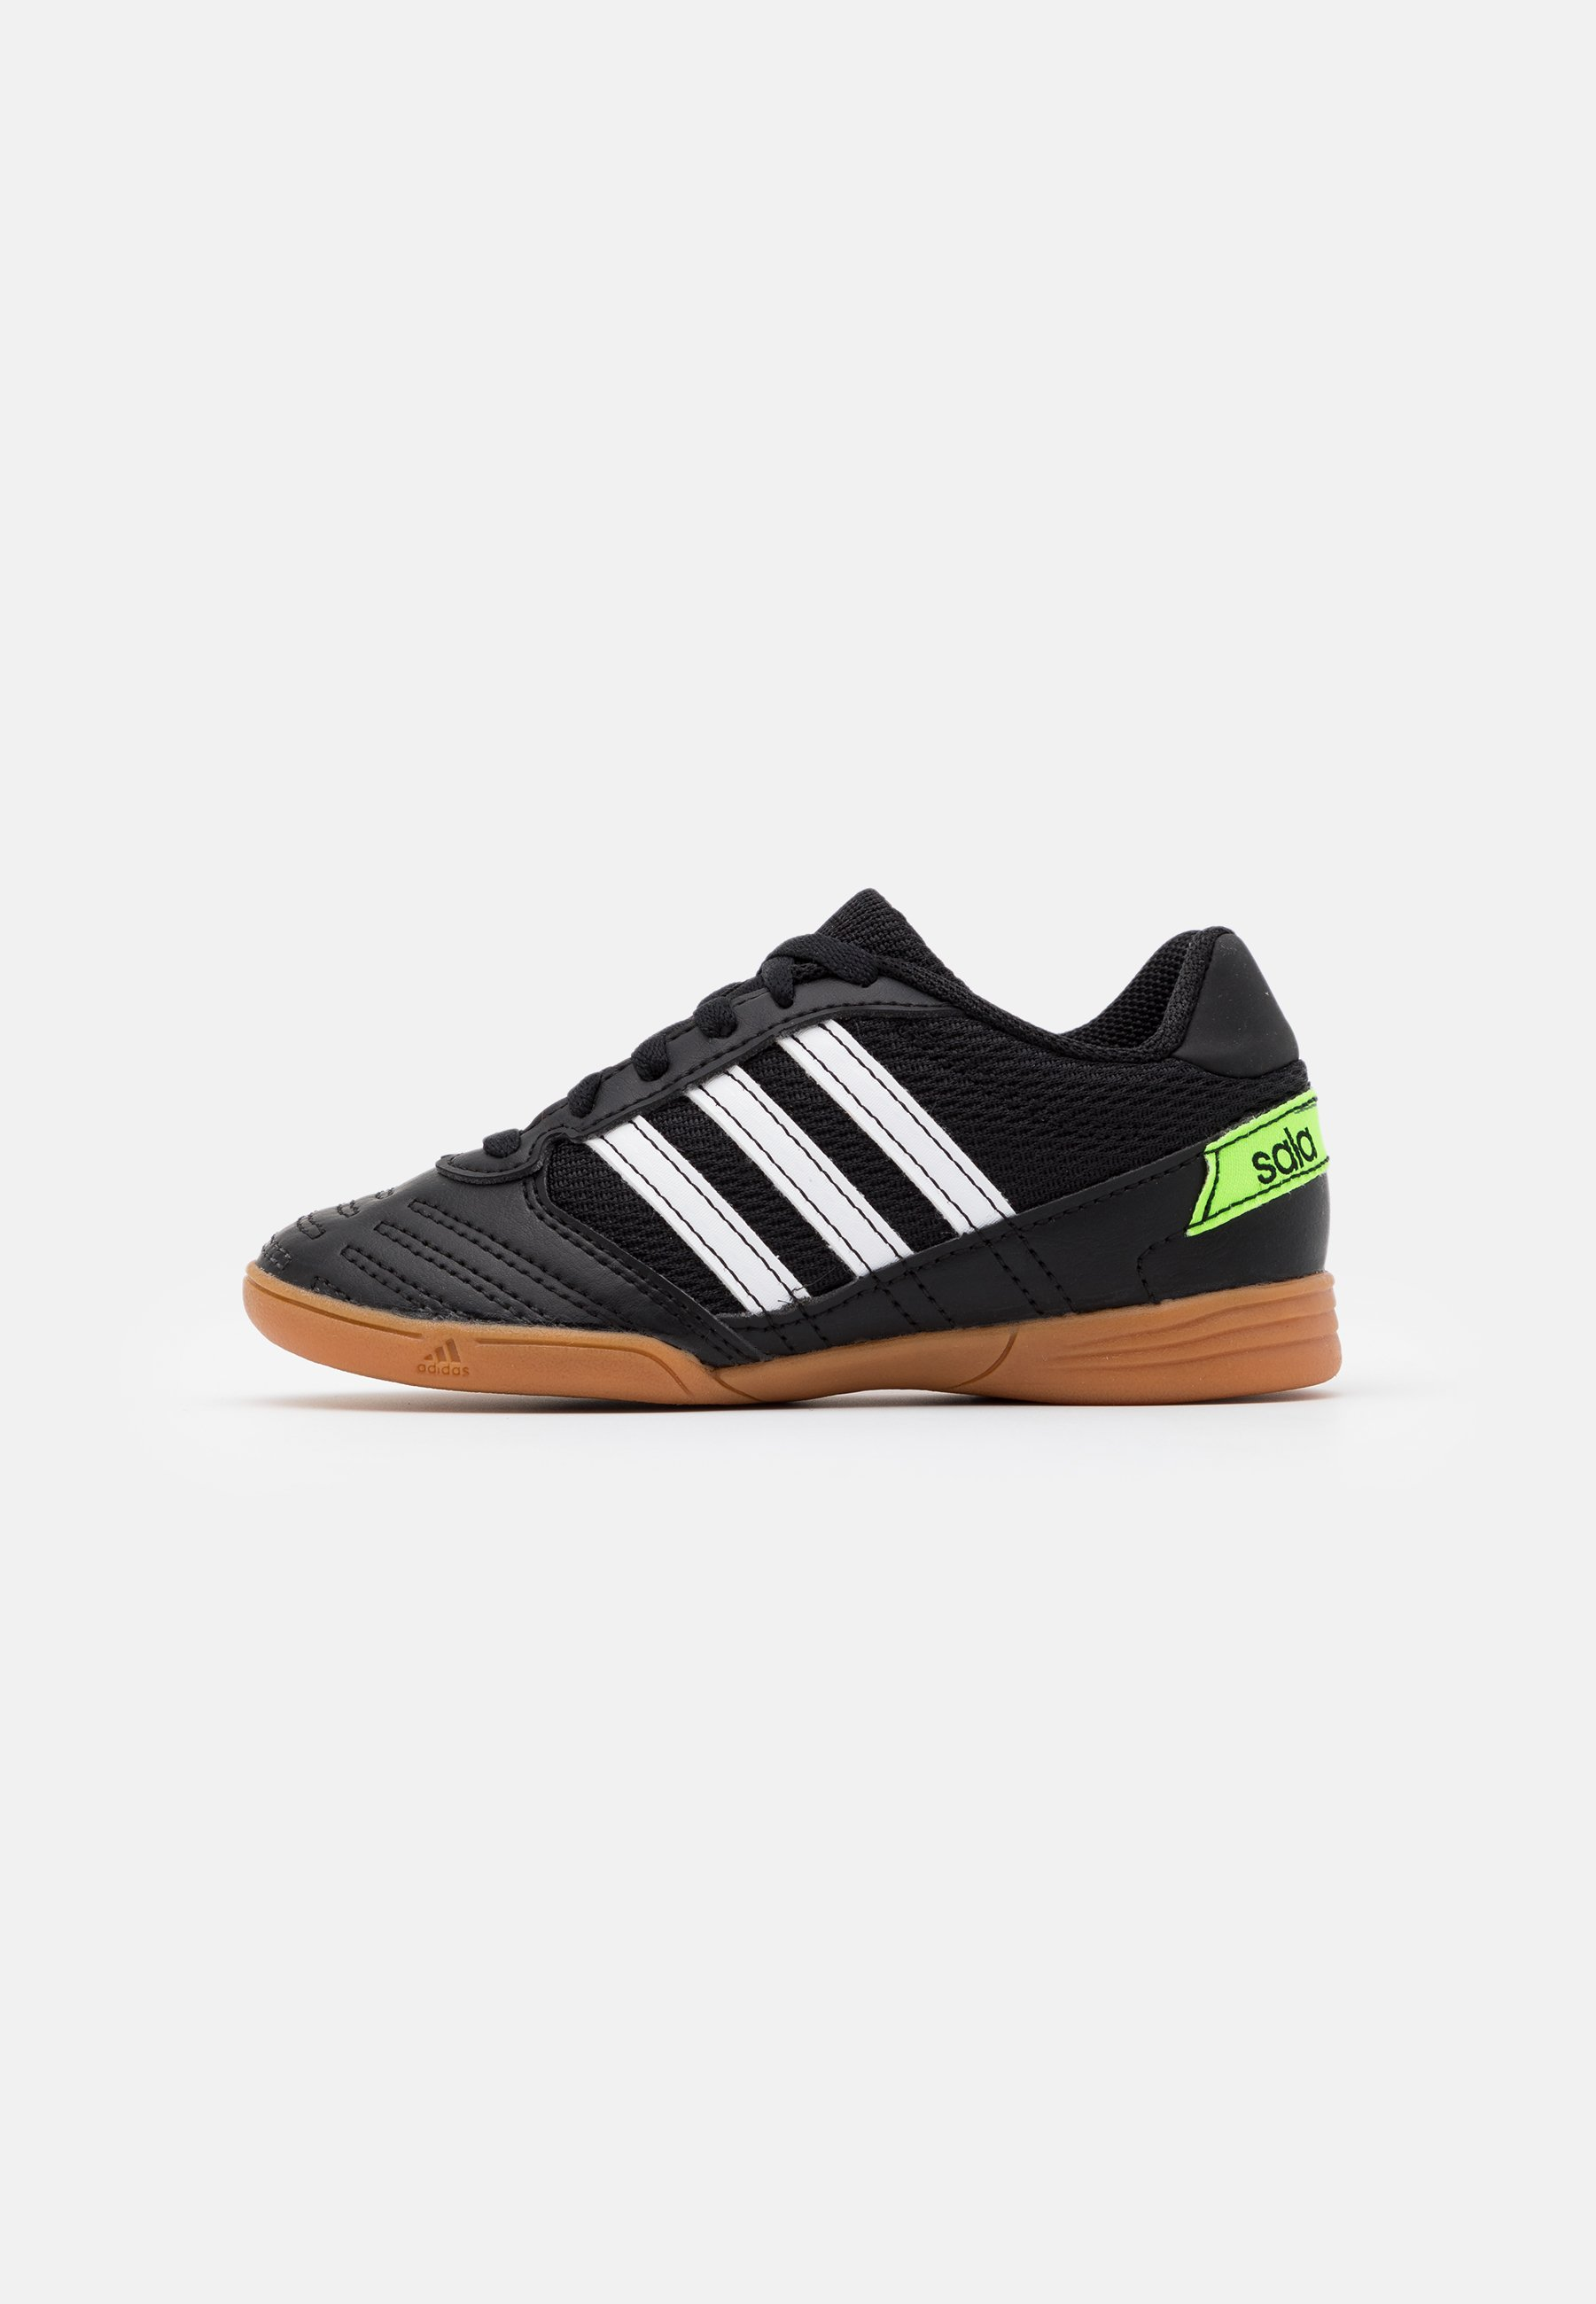 adidas chaussure foot salle